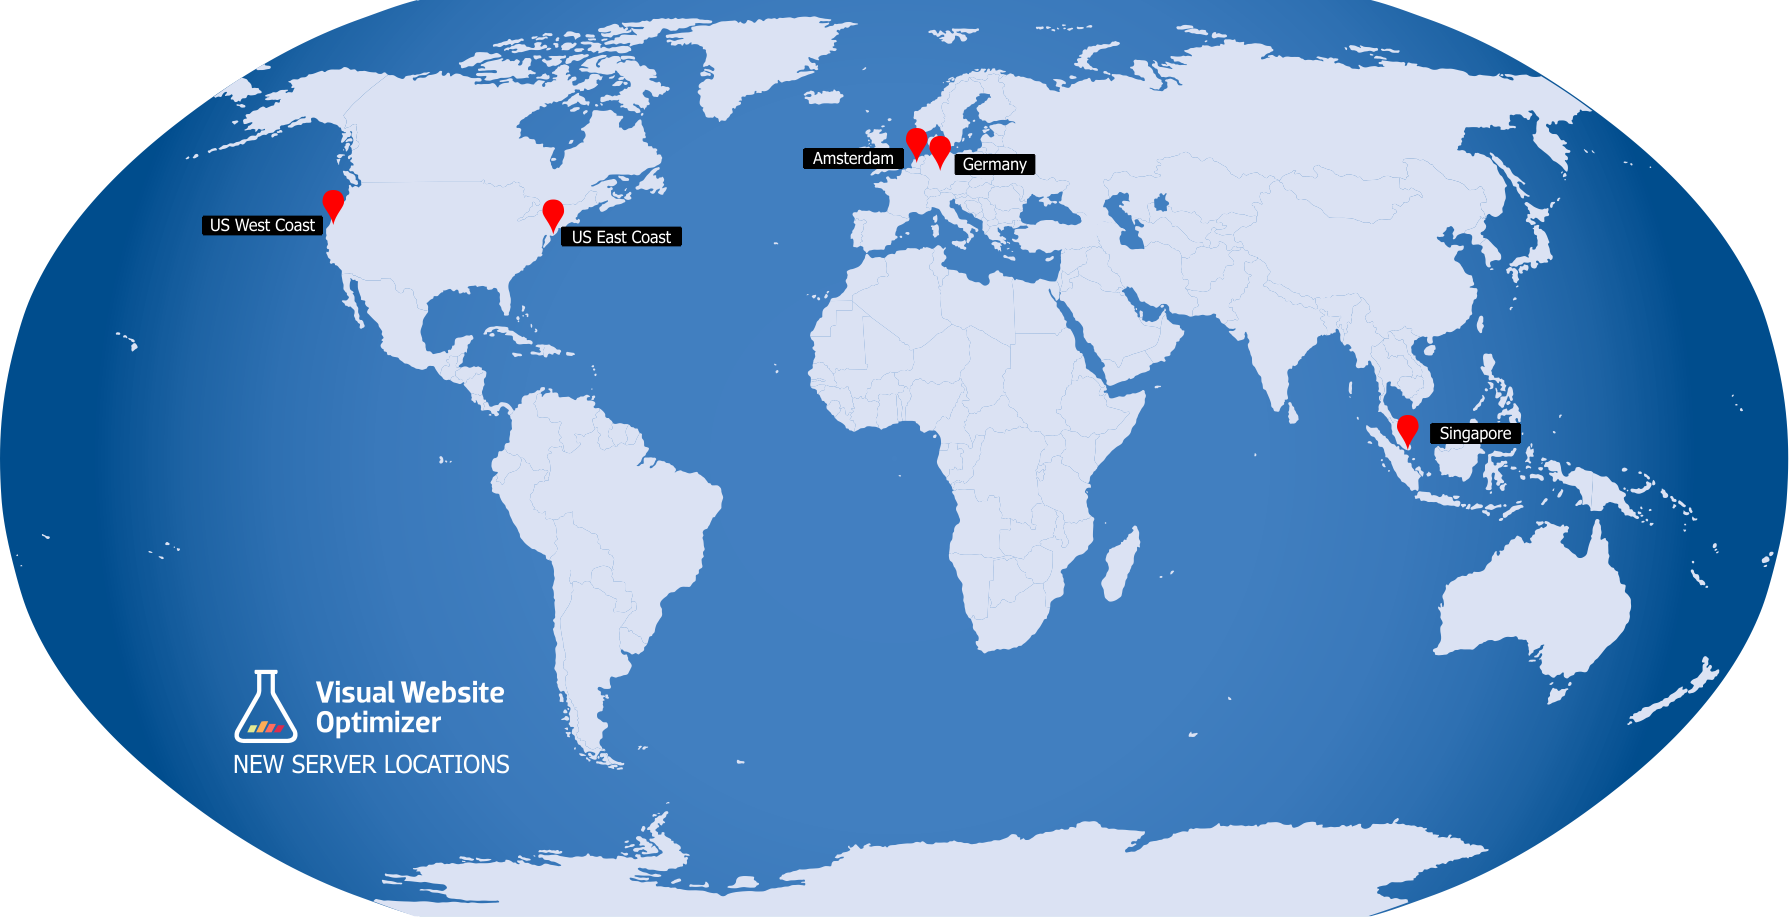 Visual Website Optimizer server locations